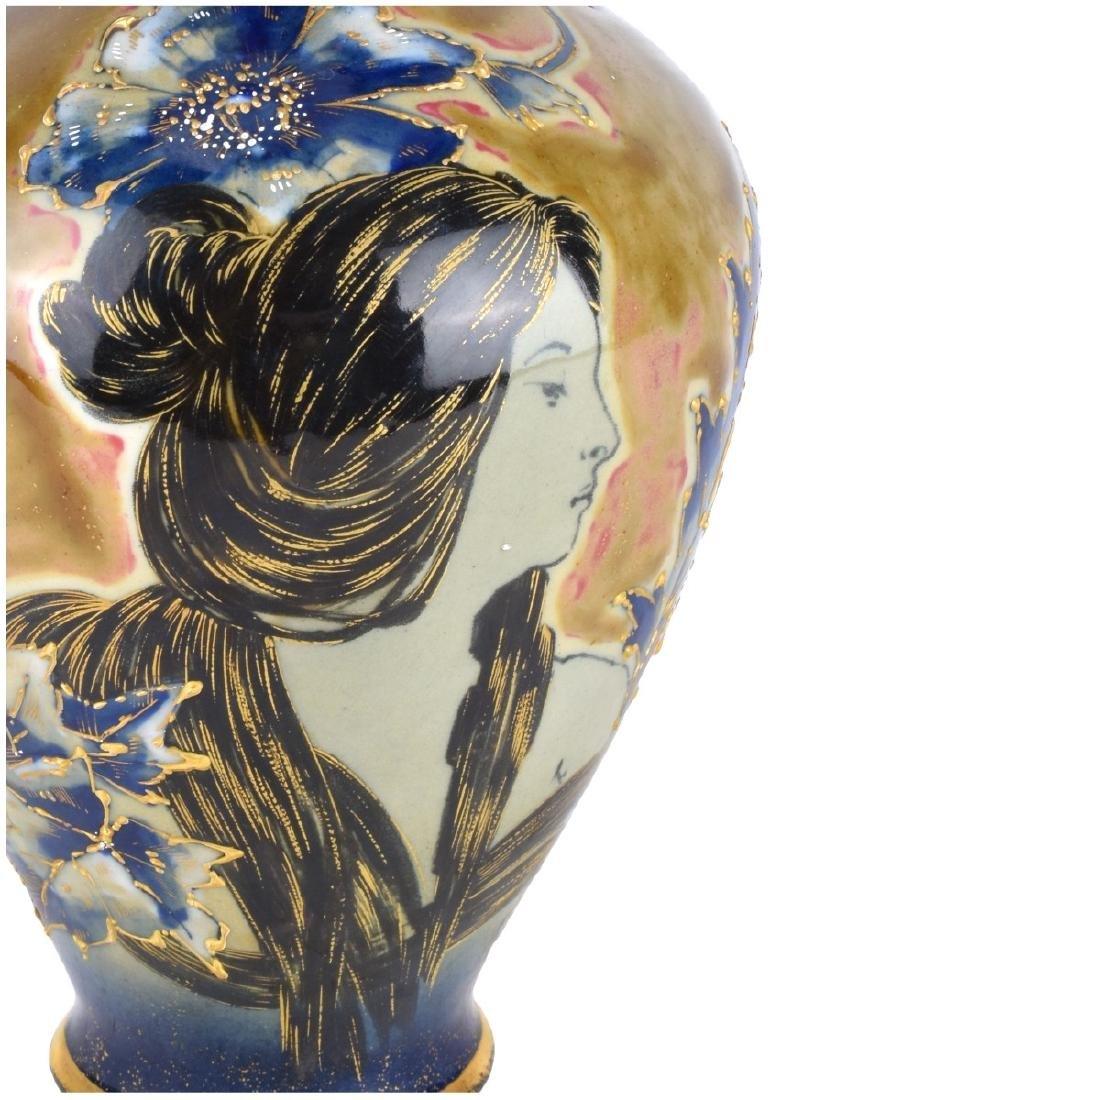 Turn Teplitz Amphora Porcelain Maiden Vase - 5